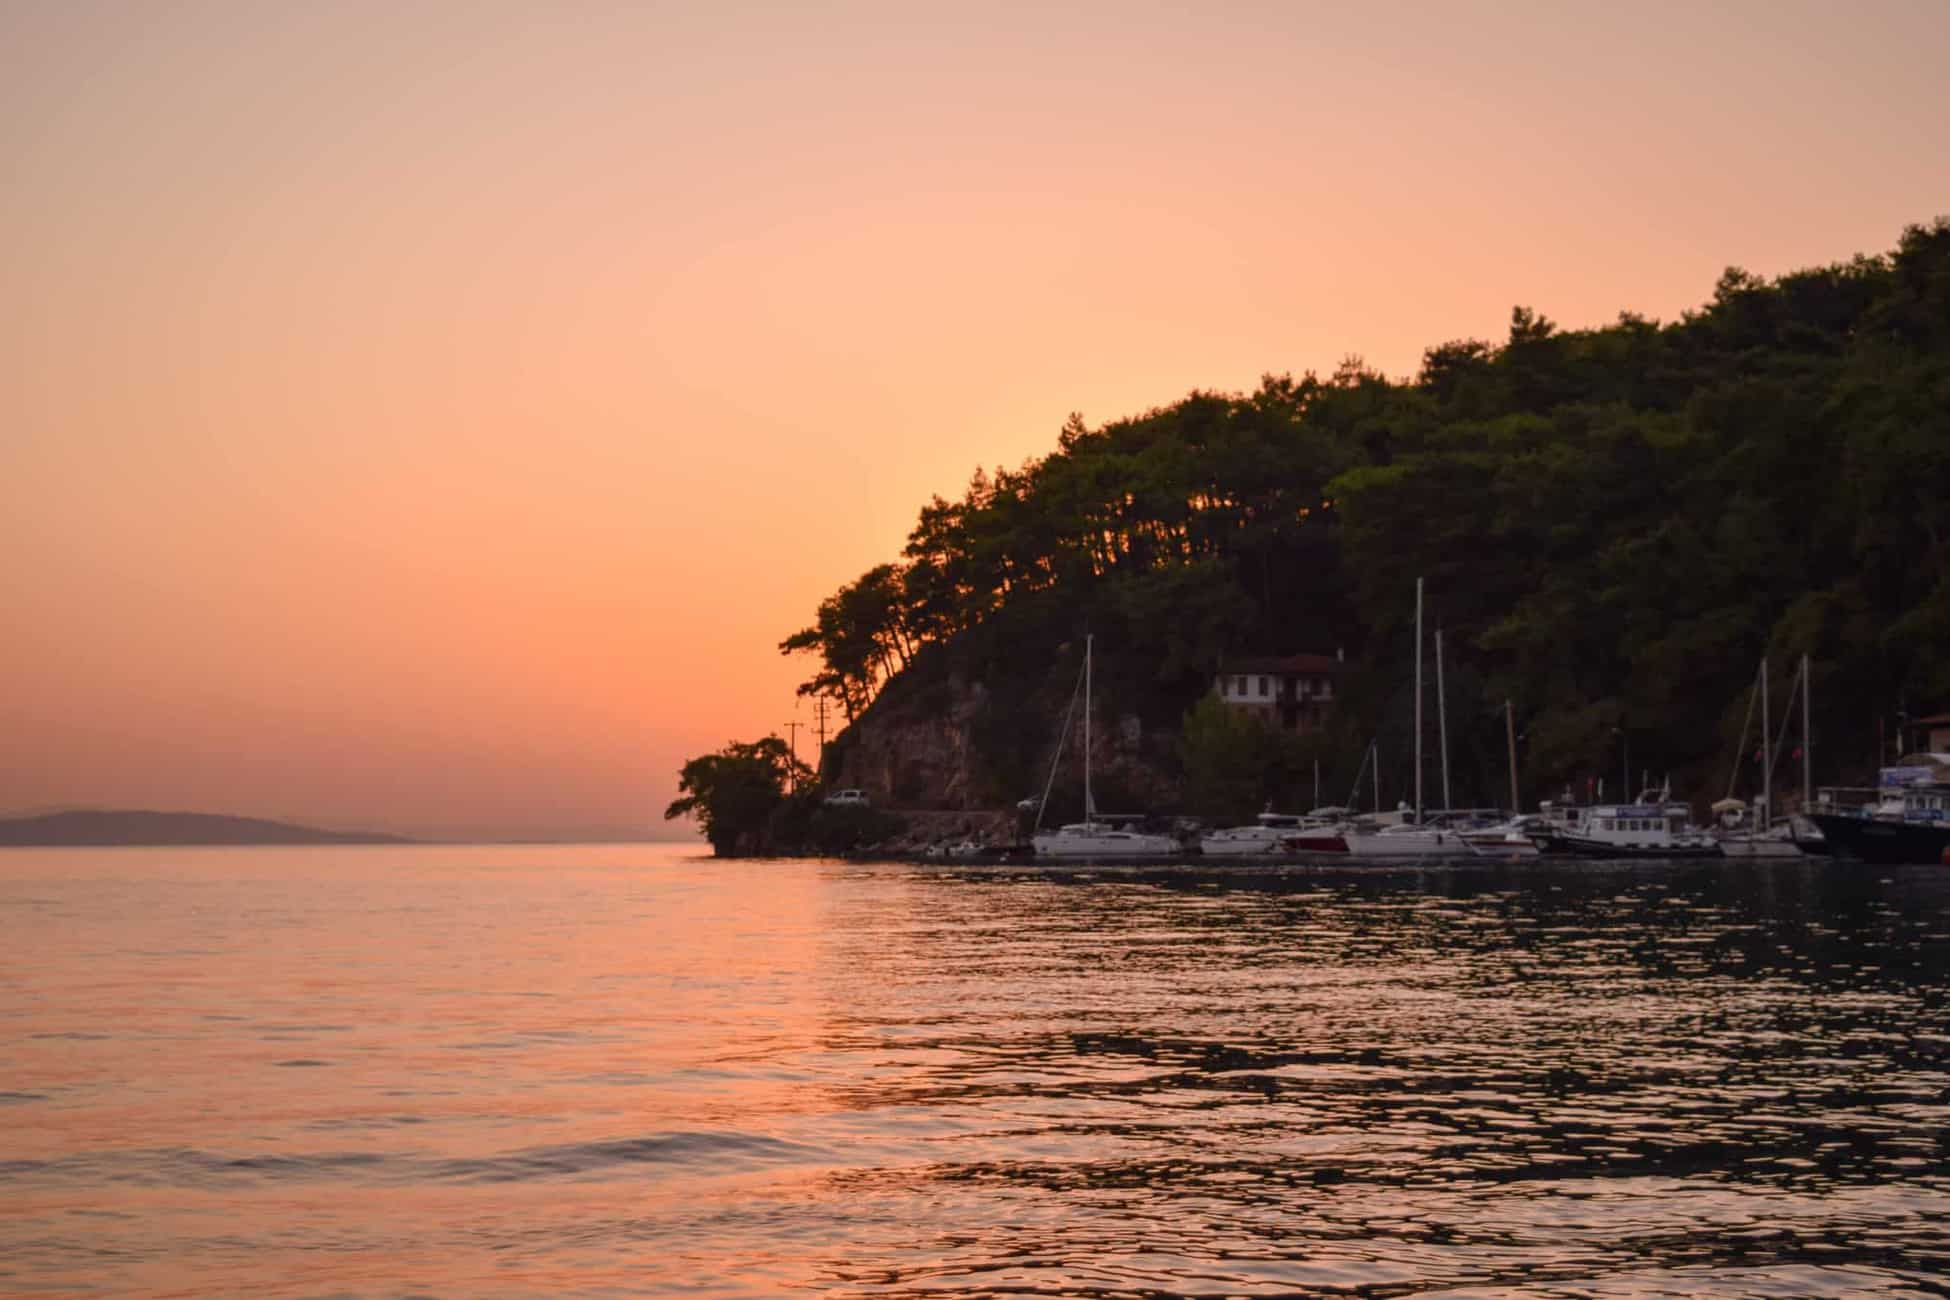 Sunsets at Akyaka Mahallesi waterfront